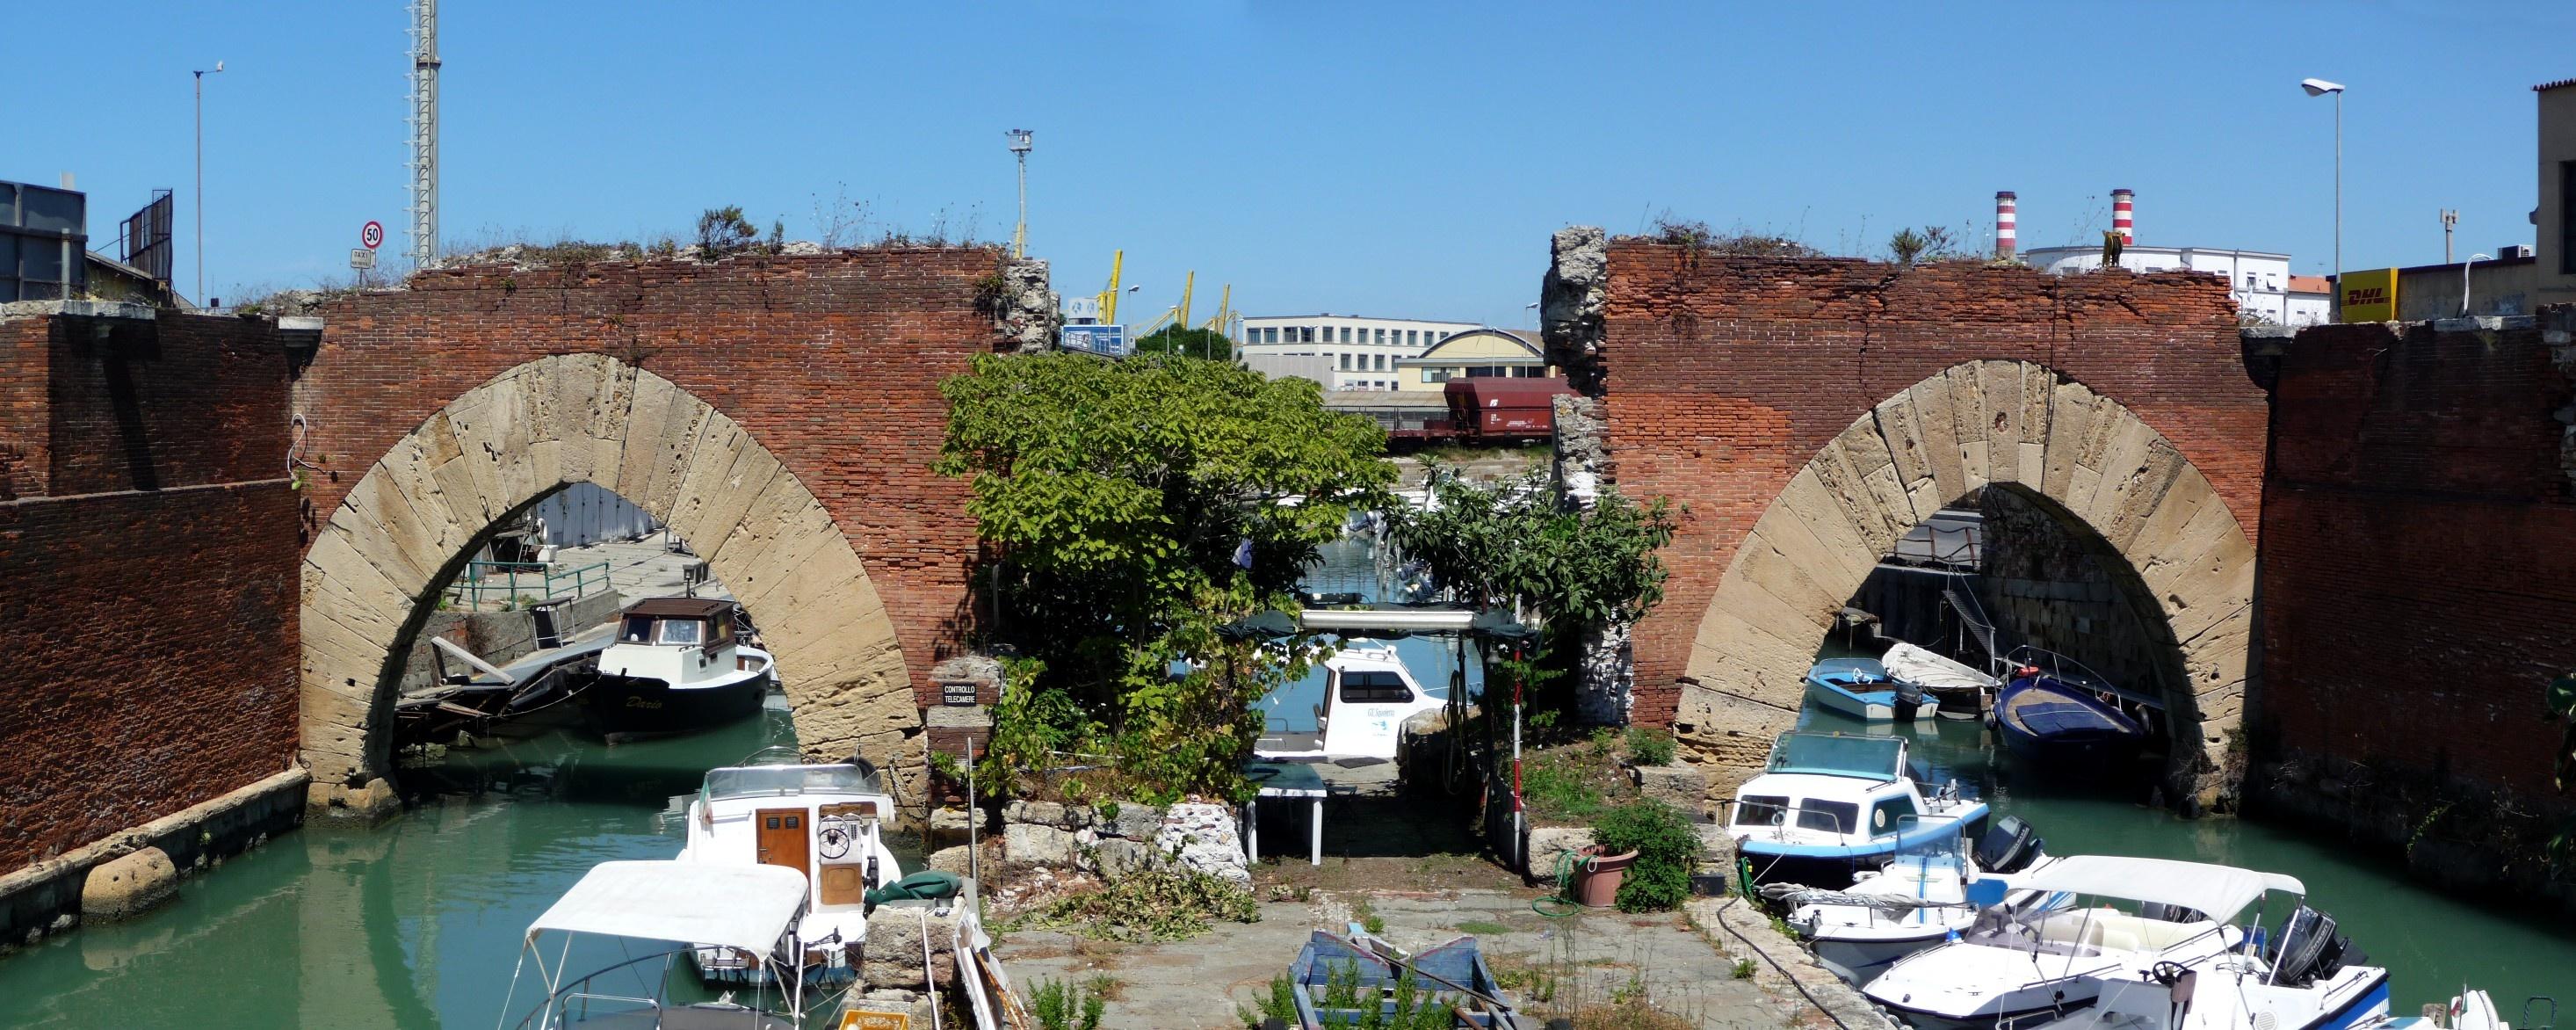 File:Dogana d'acqua, Livorno.jpg - Wikimedia Commons